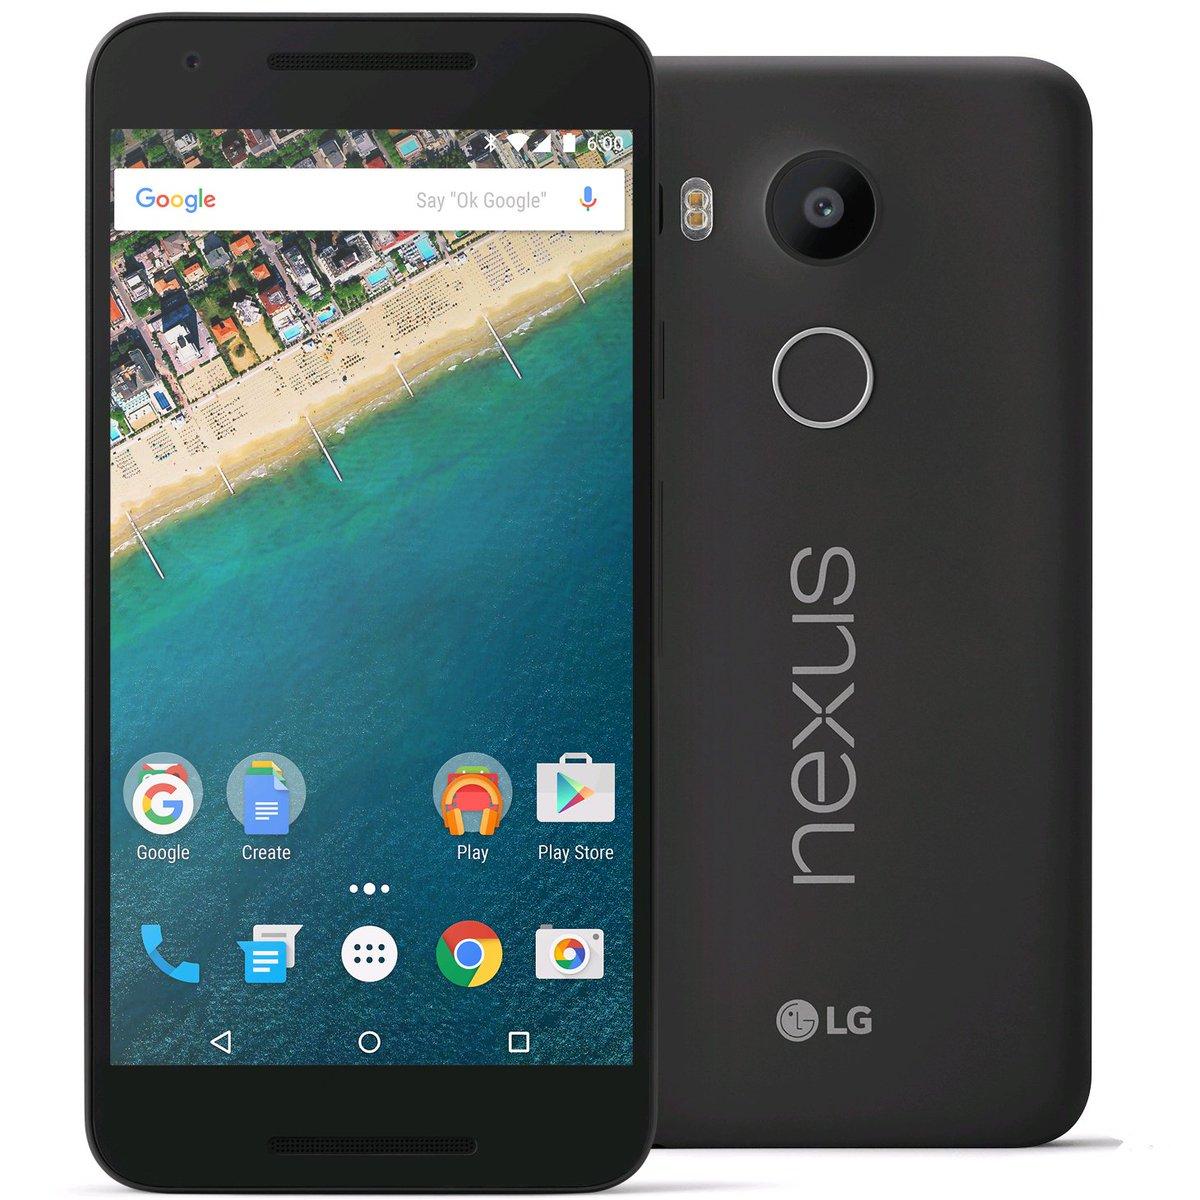 SIMフリーNexusが遂に3.1万円まで値下げ >ExpansysにてGoogle Nexus 5x 16GBが特価31,535円、送料無料! #Nexus5x #Android https://t.co/u4yPNIfiFk https://t.co/x2E5uK4JU3